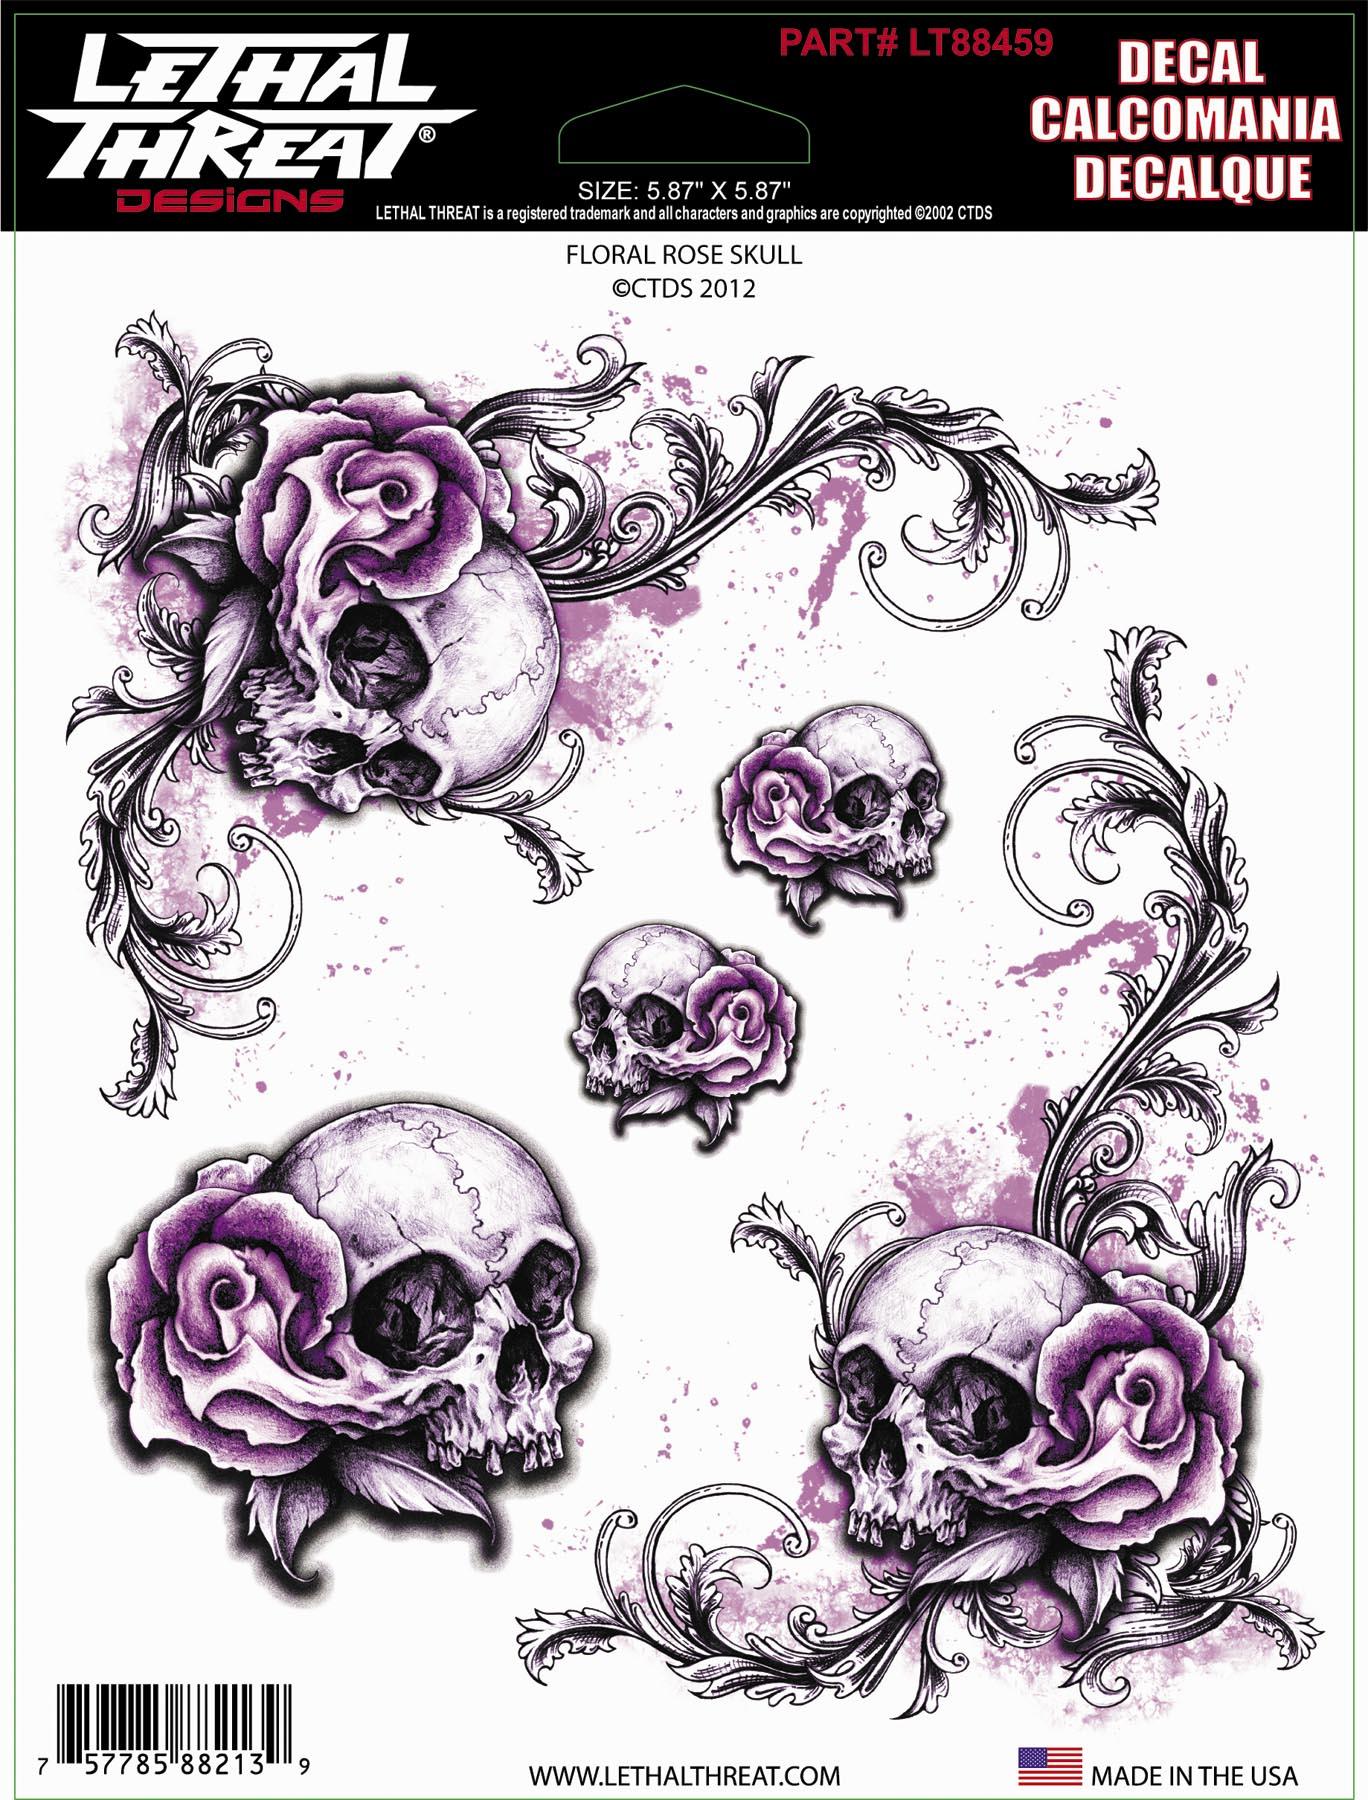 Lethal Threat Floral Rose Skull Decal